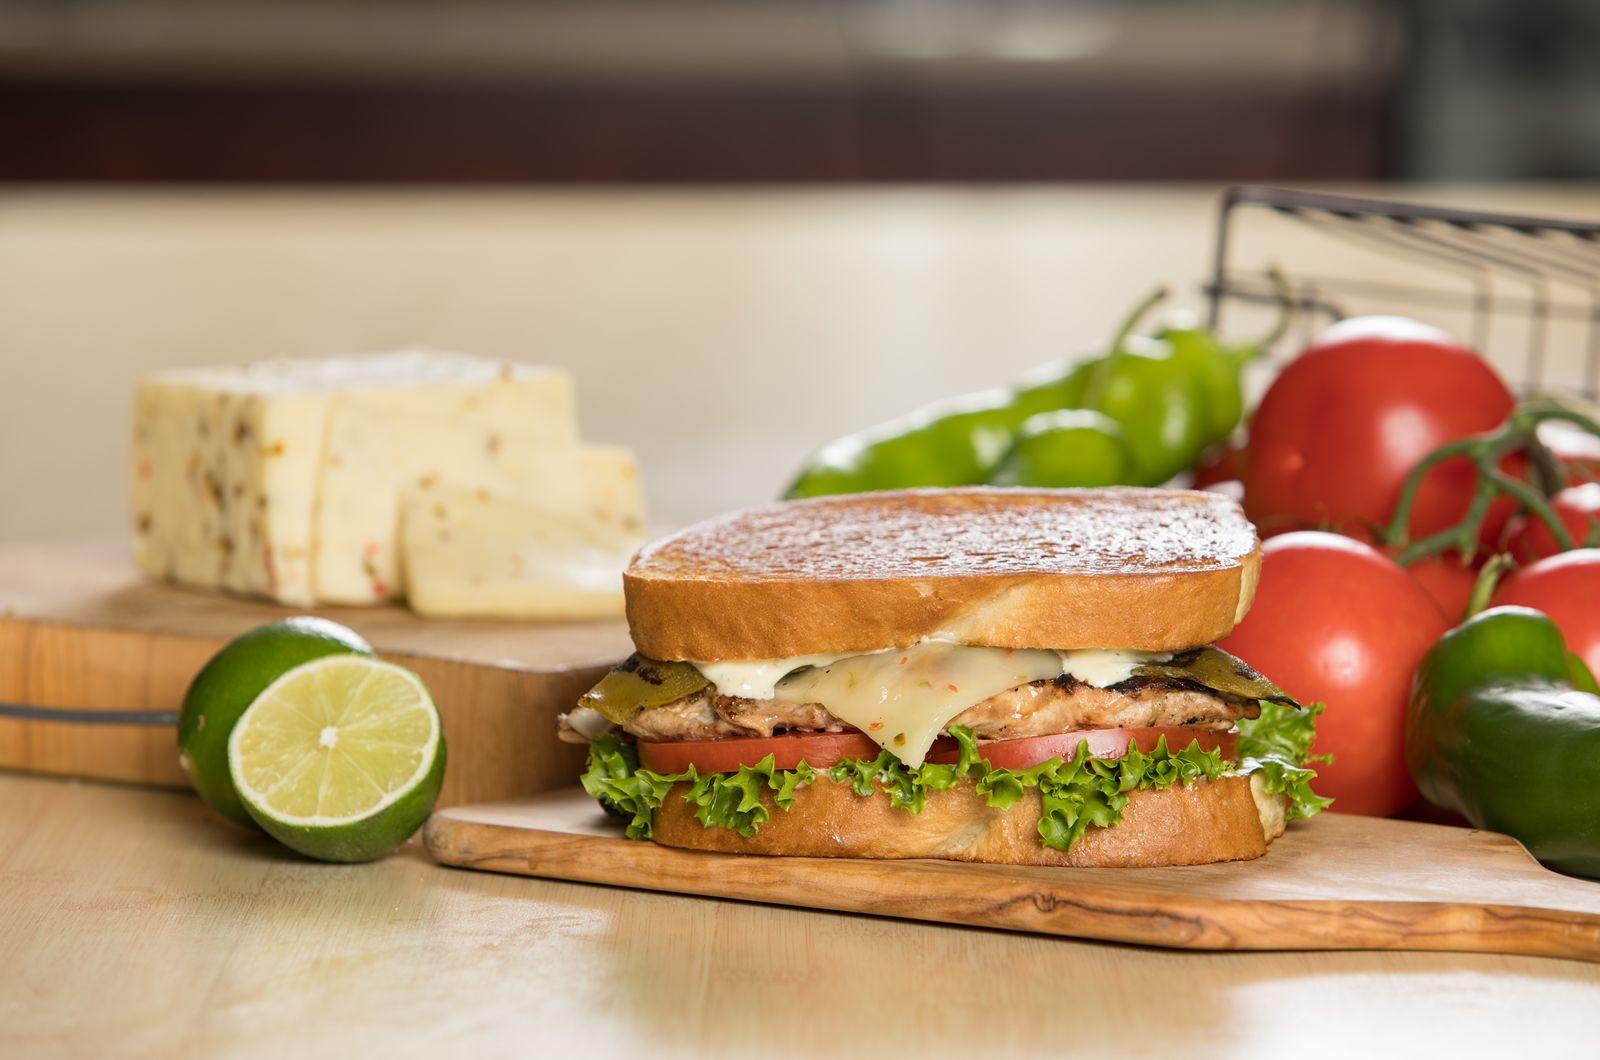 The Habit Burger Grill Features Seasonal Hatch Chile Menu Items Restaurantnewsrelease Com